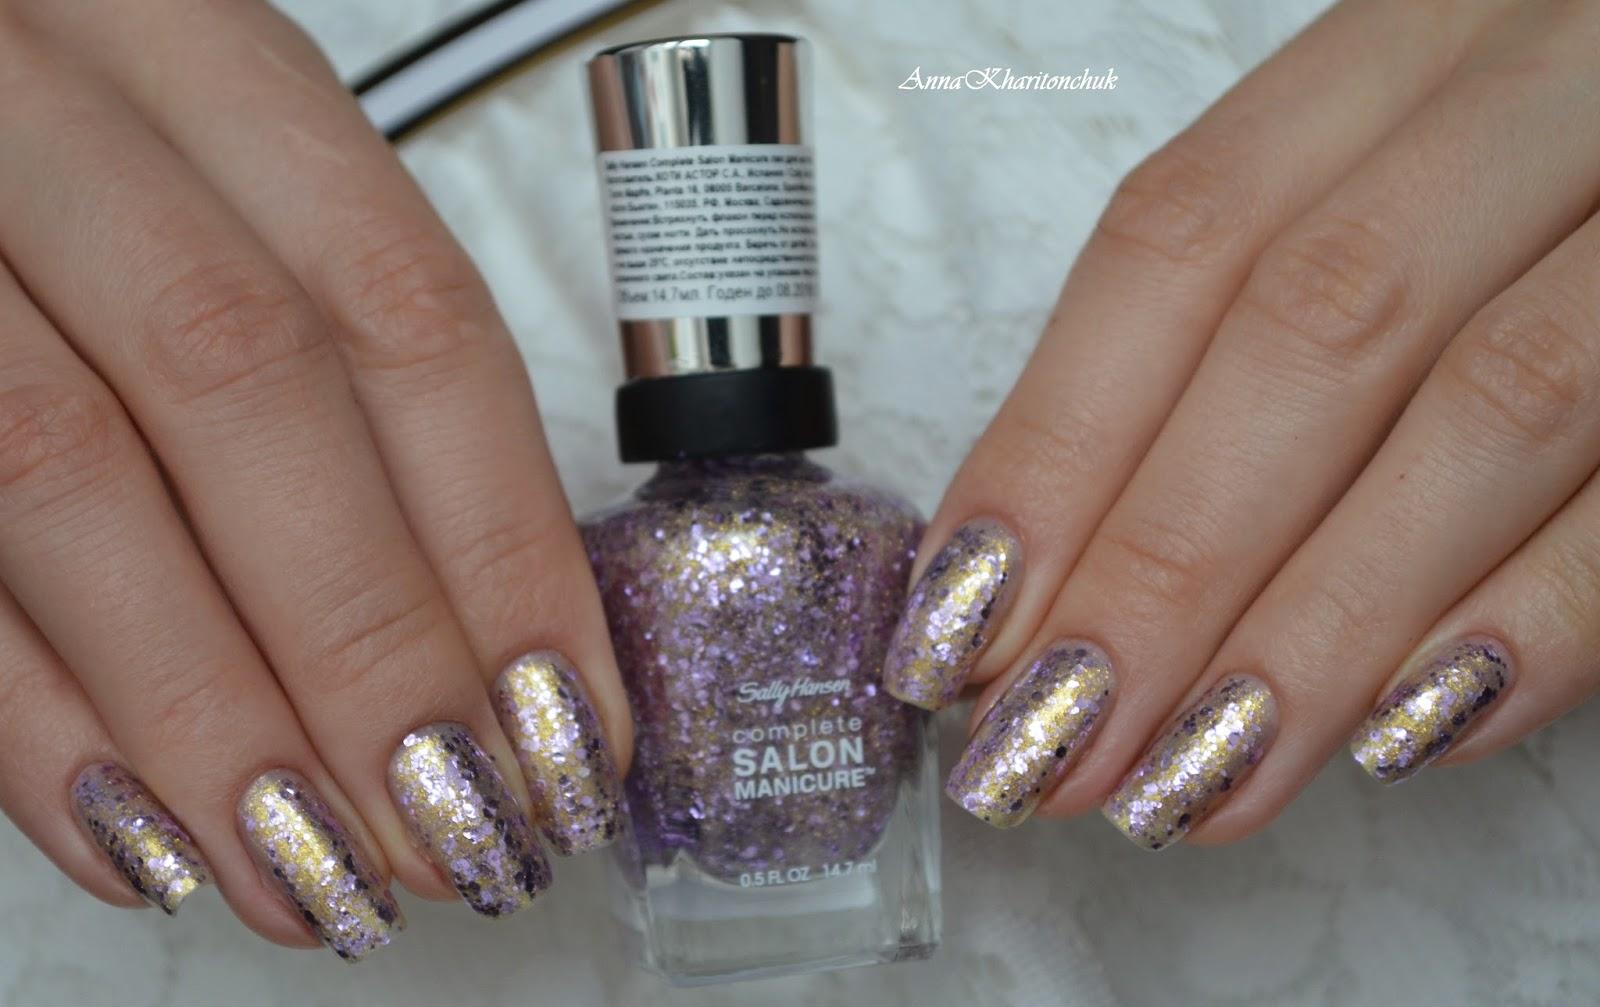 Winter11DNC. Новогодний маникюр. Sally Hansen Complete Salon Manicure #706 Glitter Bomb и Sally Hansen Insta-Dri Top Coat